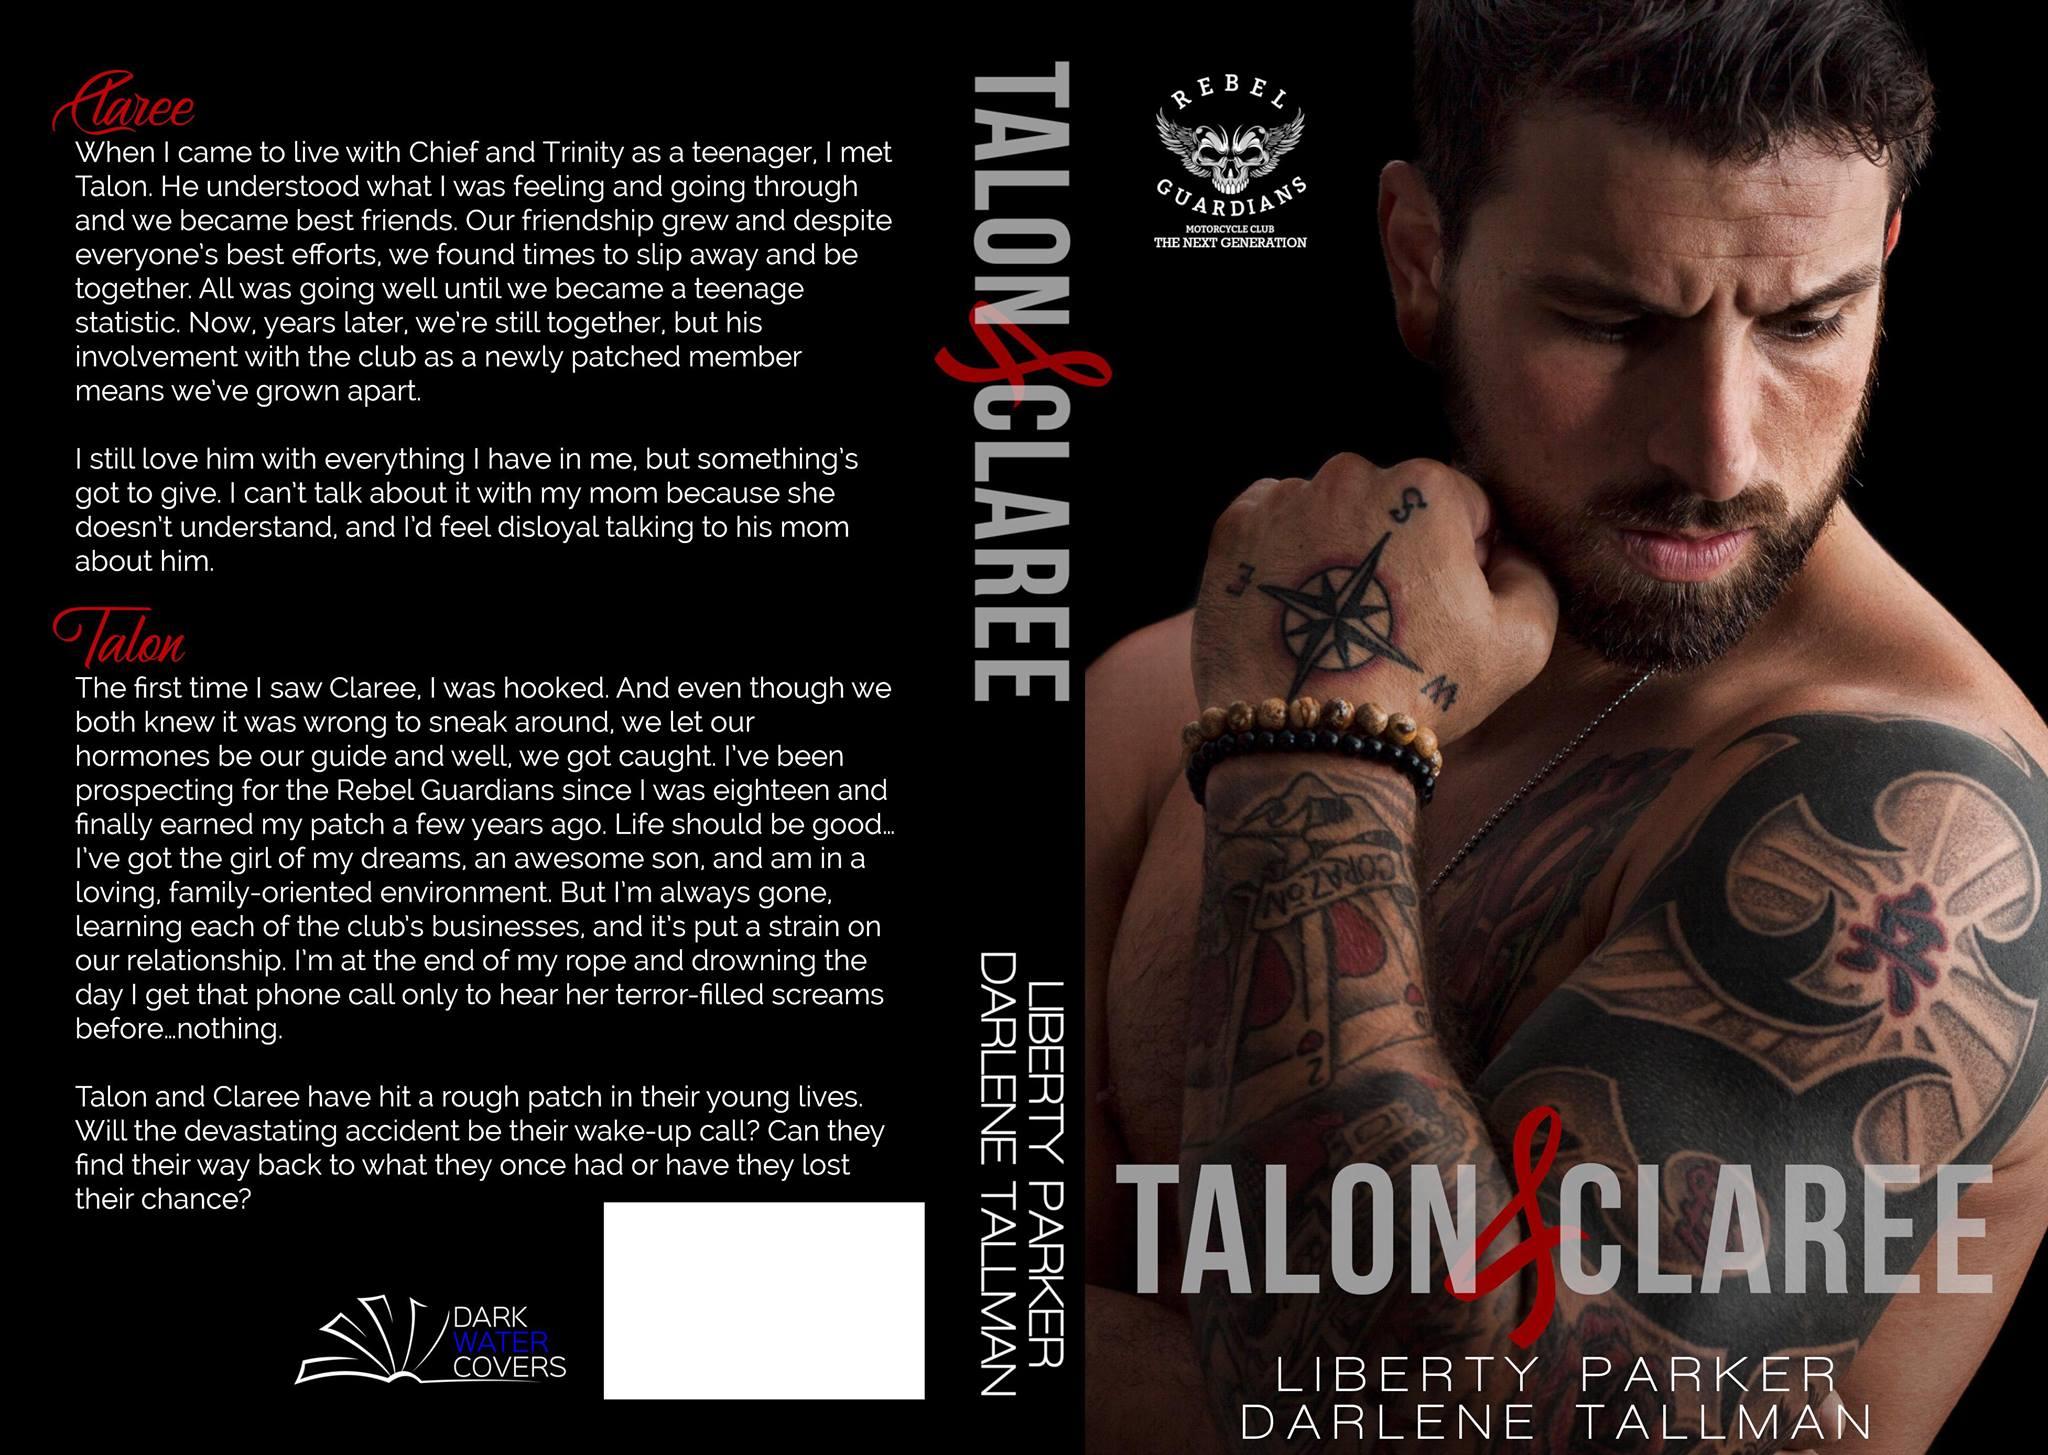 Talon & Claree (2).jpg